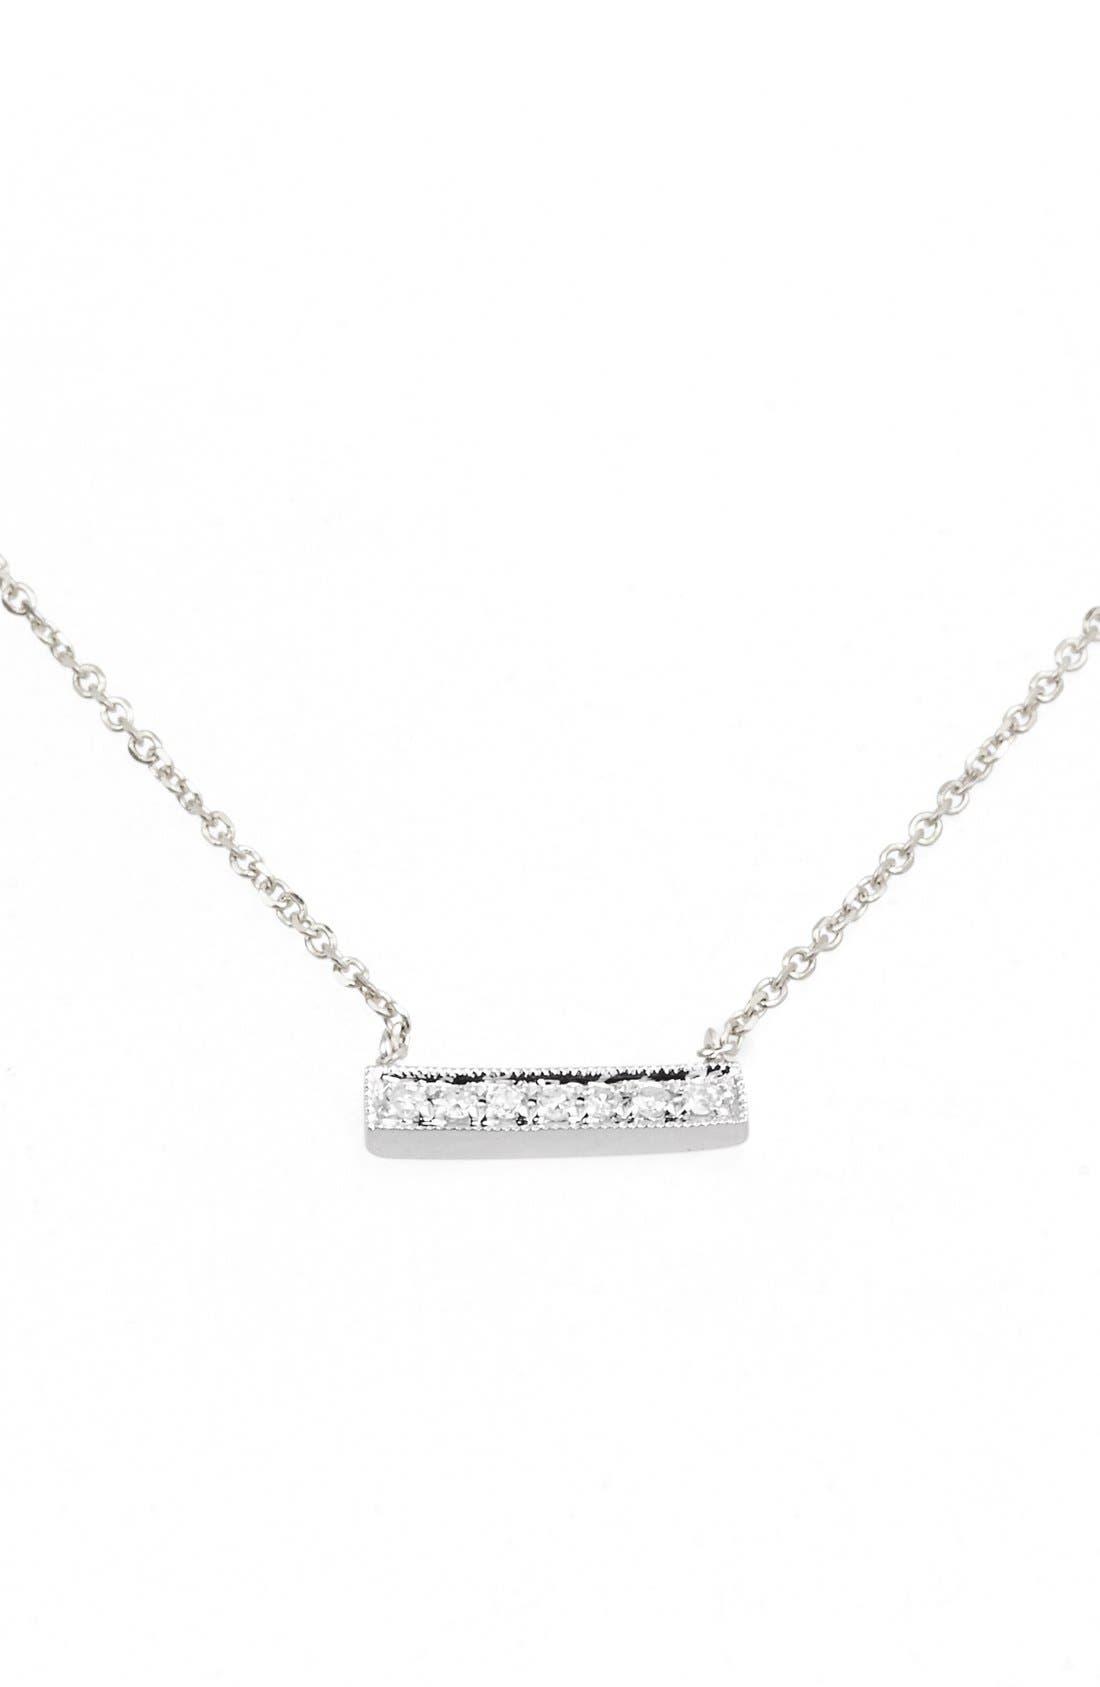 dana rebecca designs u0027sylvie roseu0027 diamond bar pendant necklace